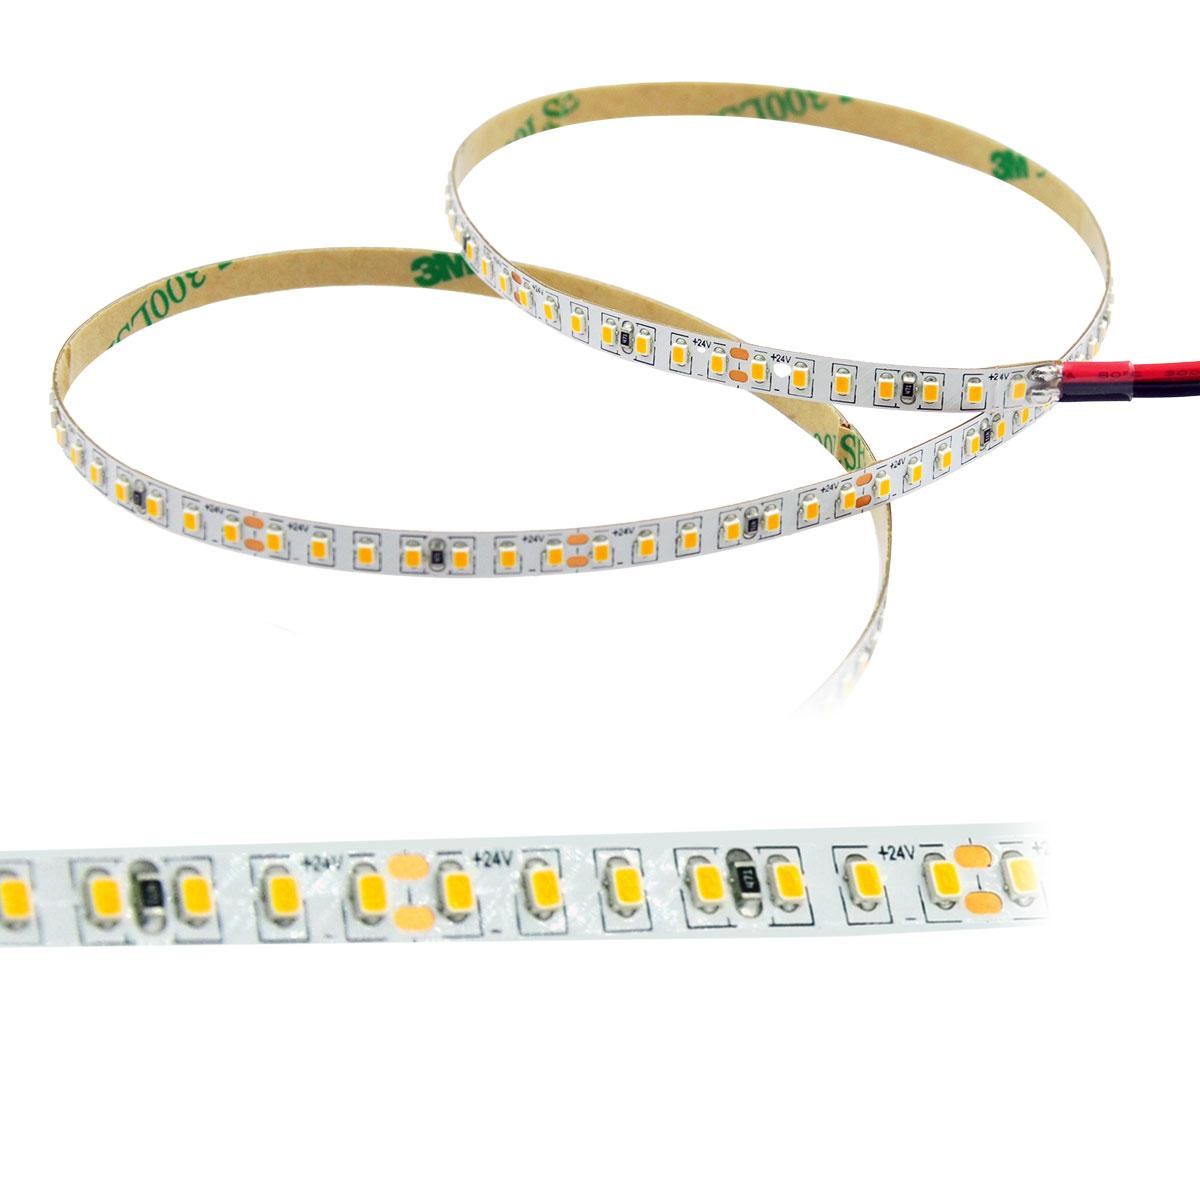 Strip Warmweiß 24V LED Streifen 5M 8W/m 224LED/m 5mm IP20 3000K